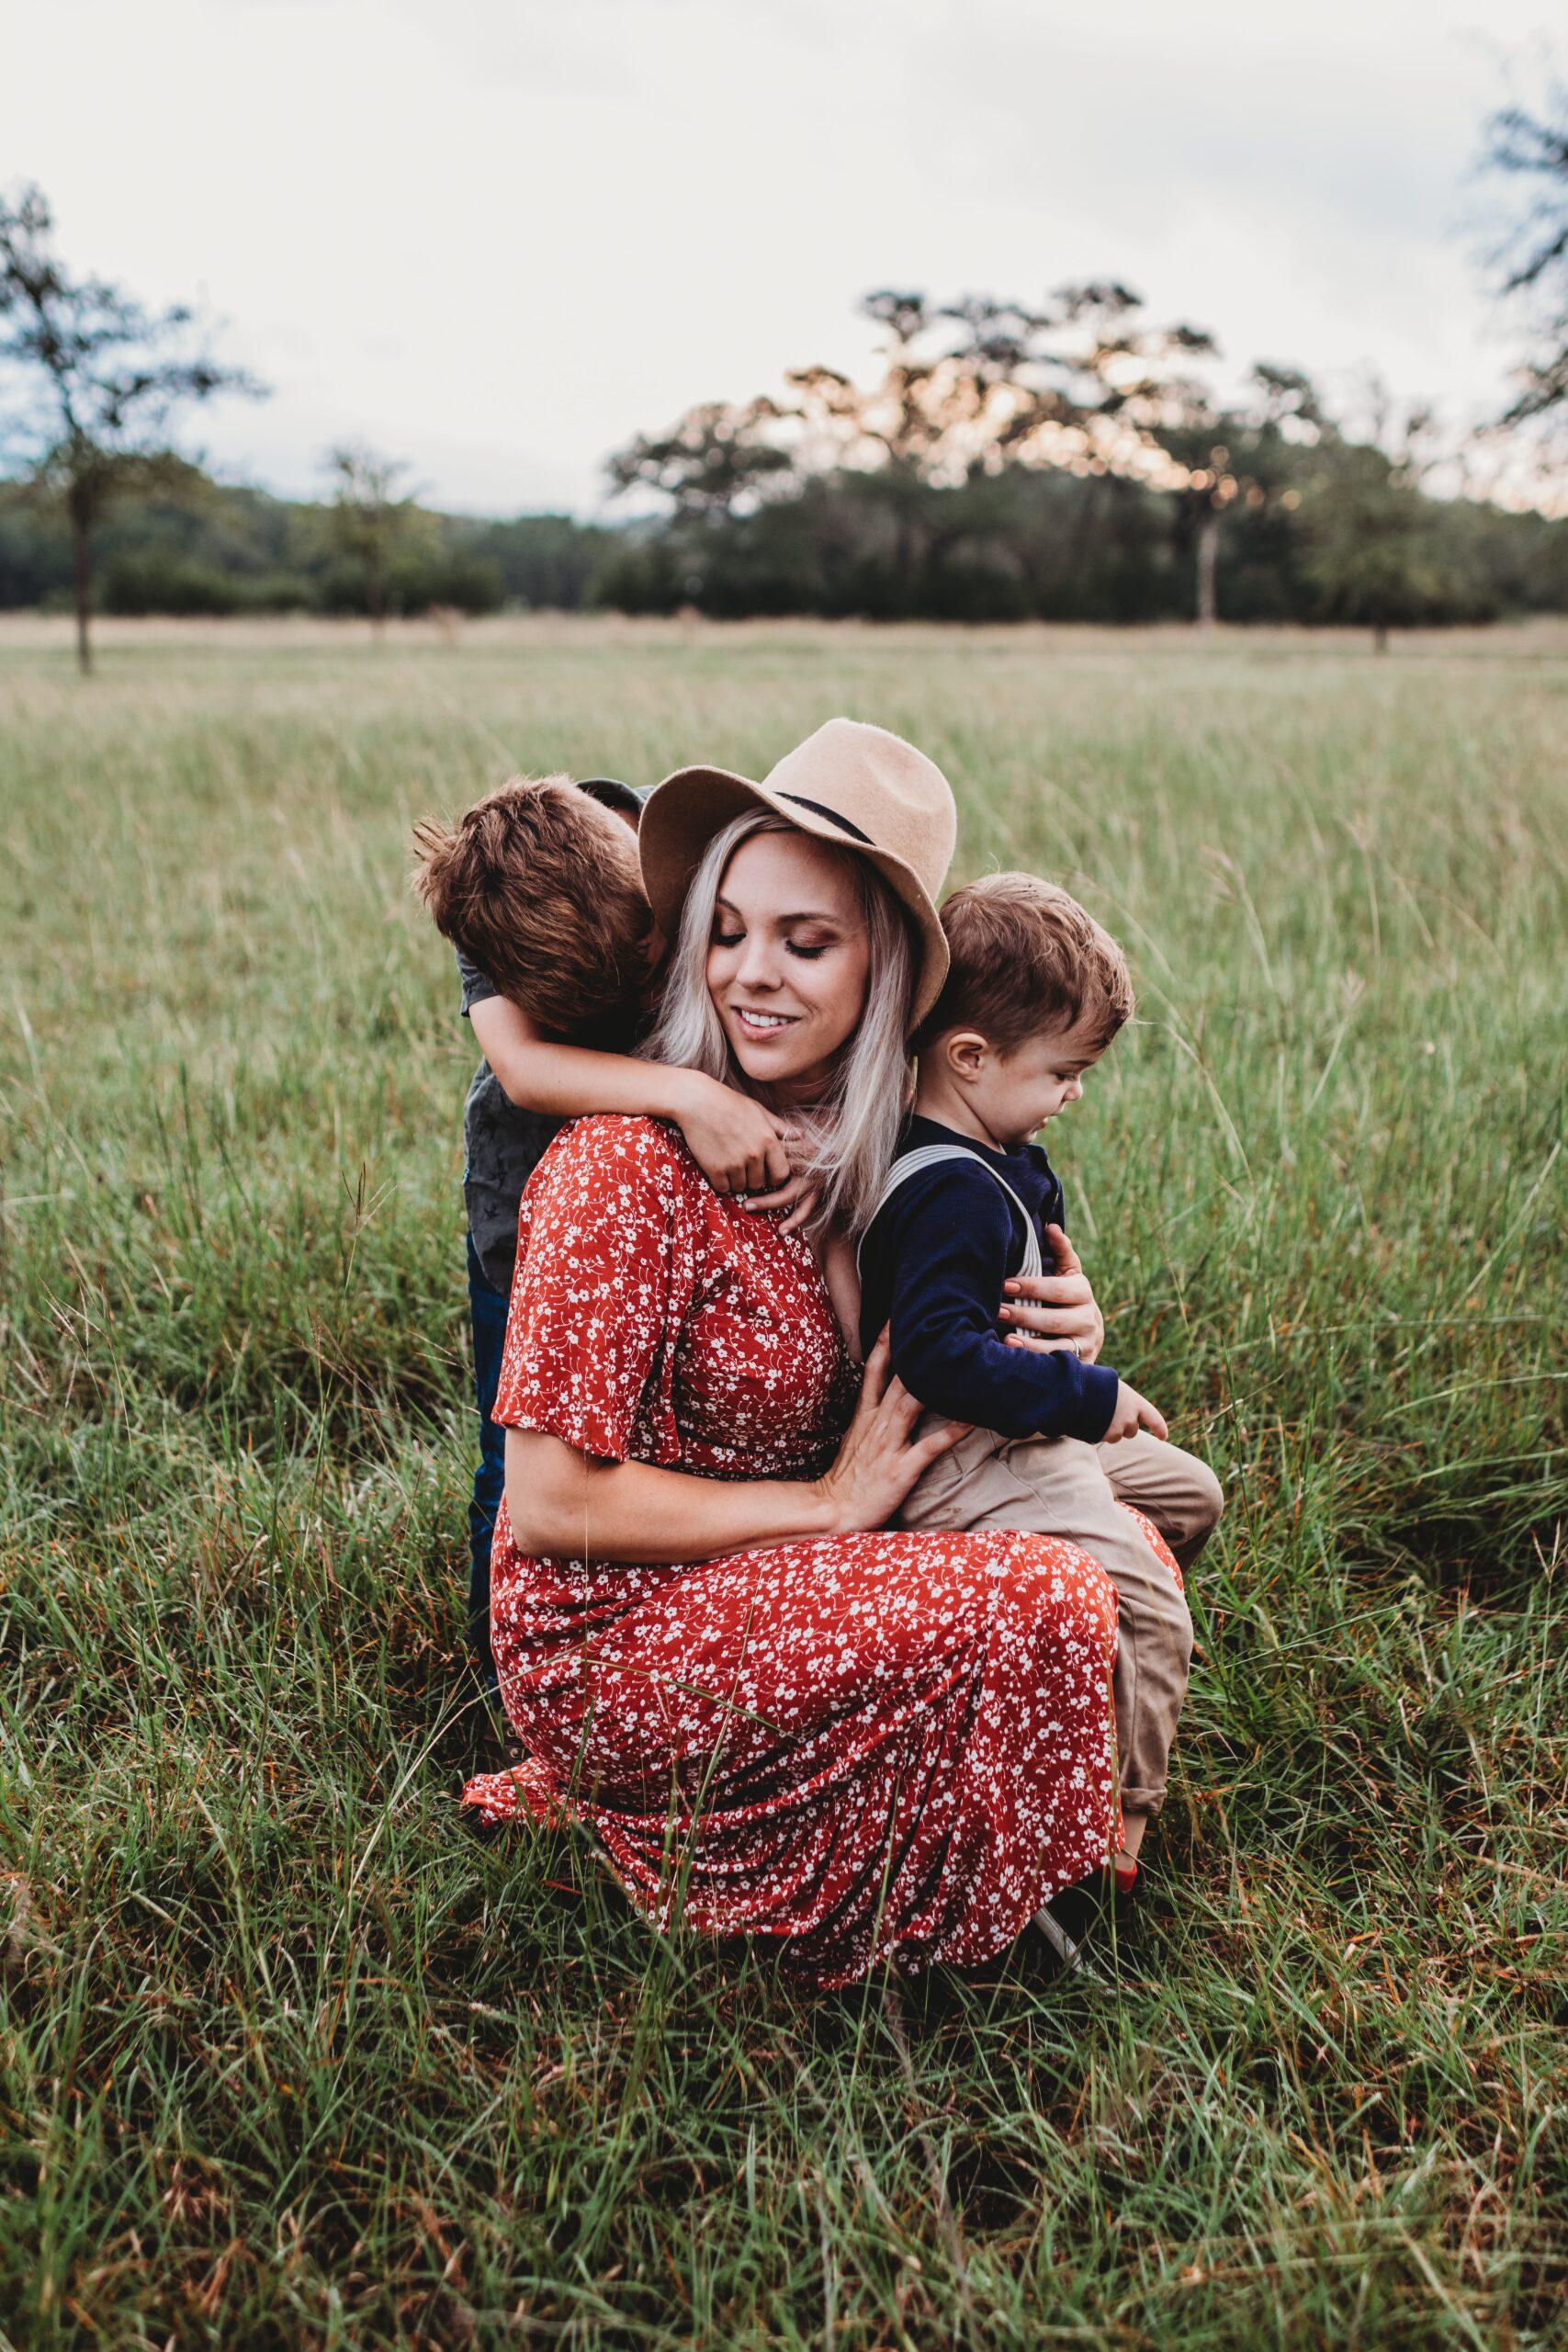 devotional, motherhood, serve, ministry, humility, selflessness, Christlikeness, follow Christ